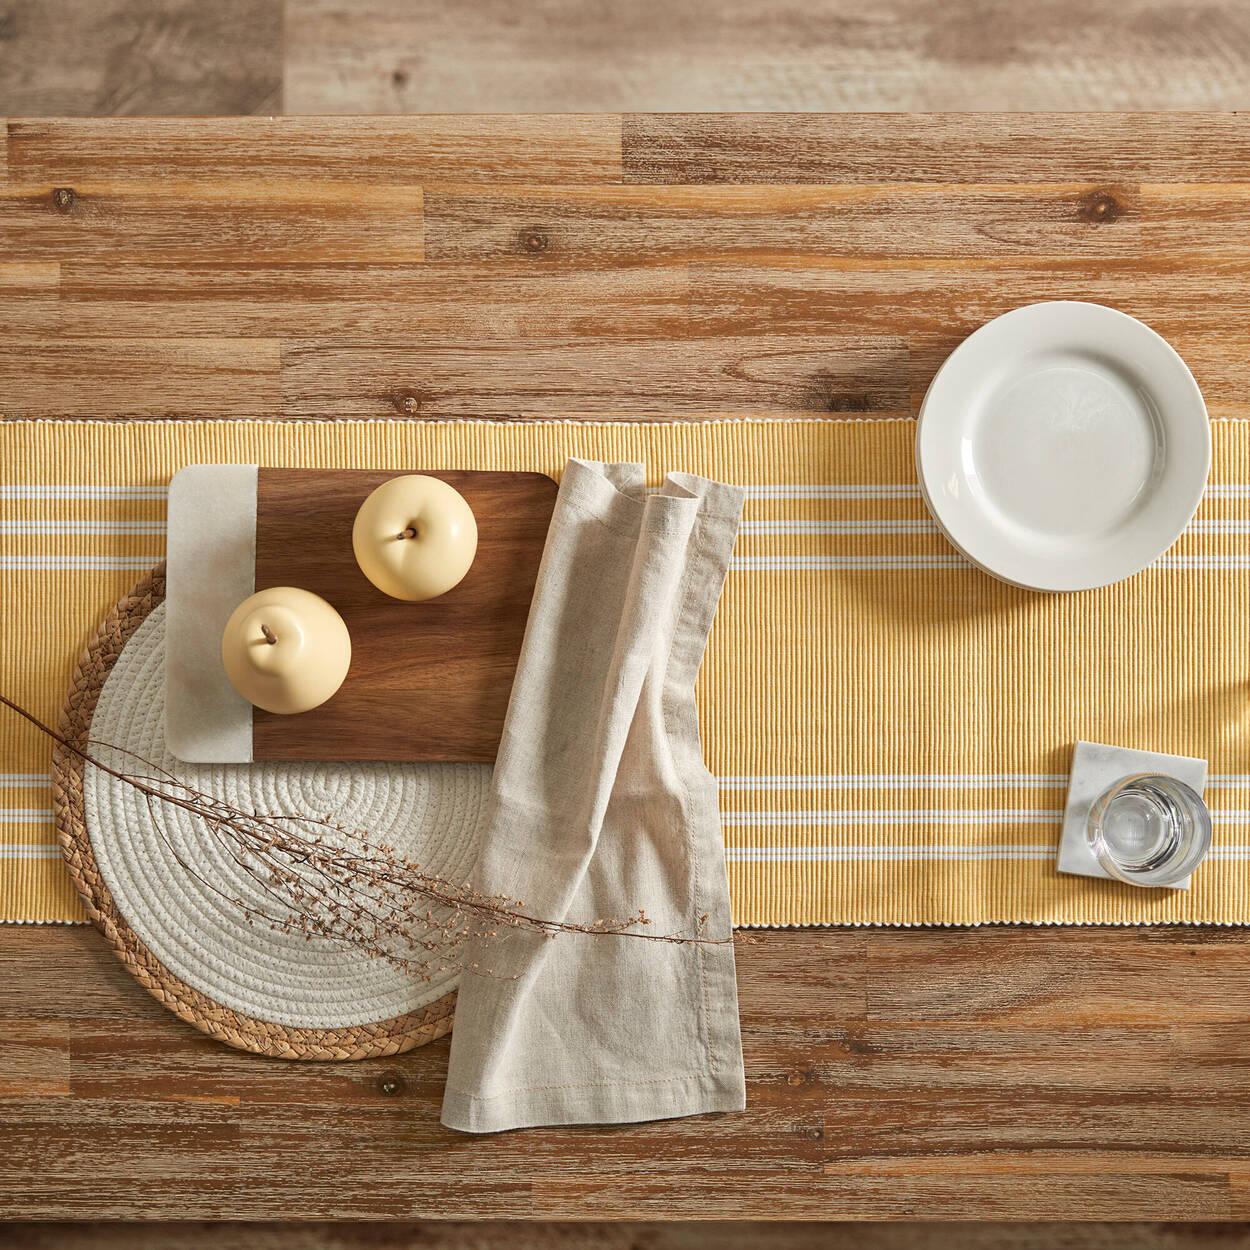 Wood and Stone Cutting Board